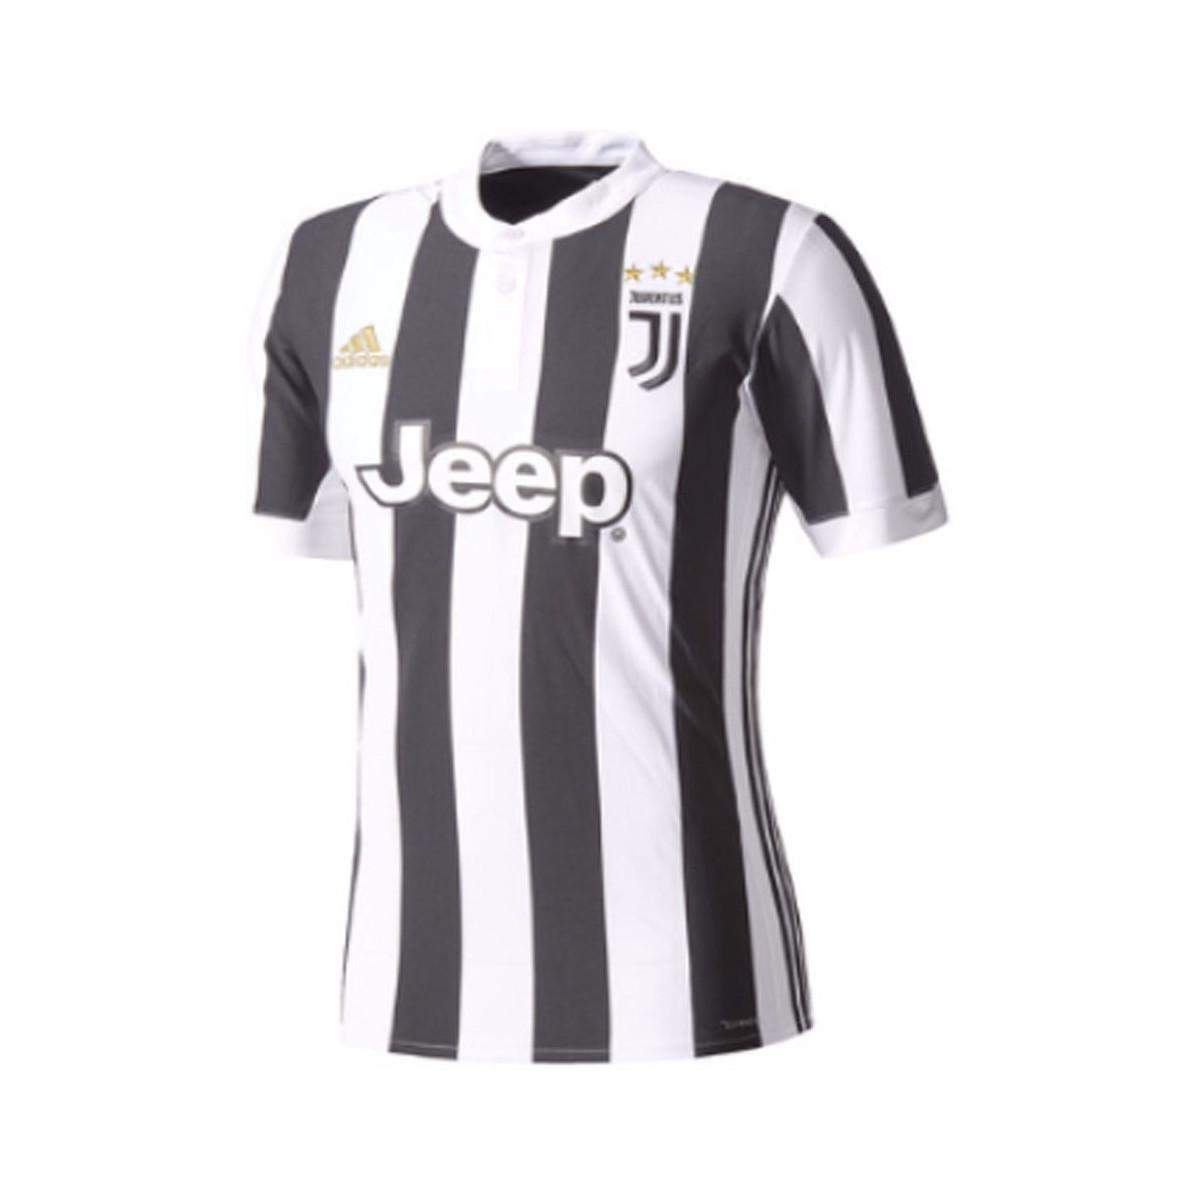 52530956d Adidas 2017-18 Juventus Home Shirt (nedved 11) Men s T Shirt In ...